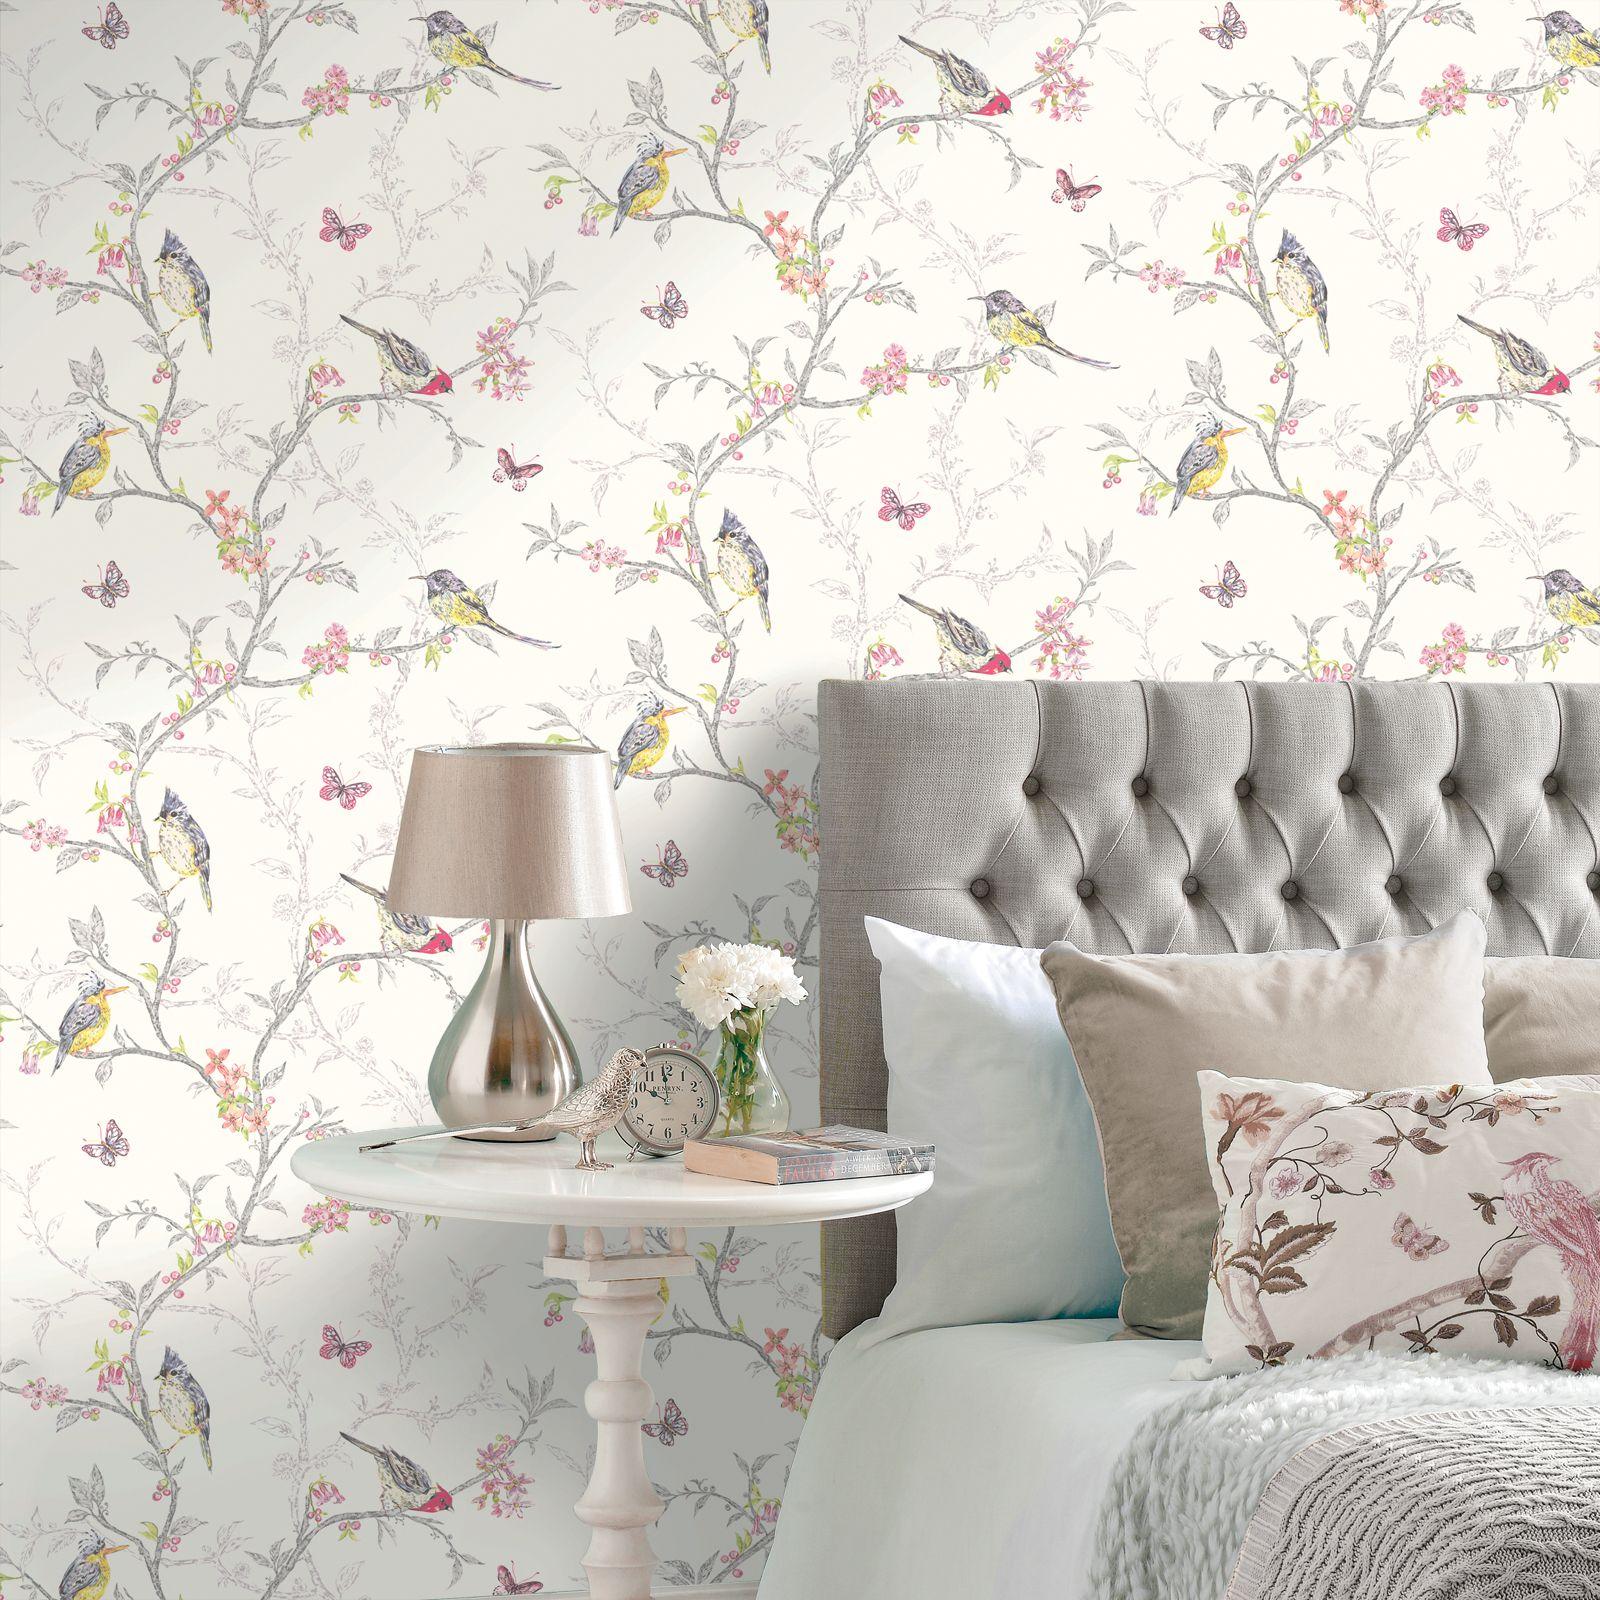 Beautiful room decor holden phoebe birds wallpaper cream for Cream wallpaper for walls